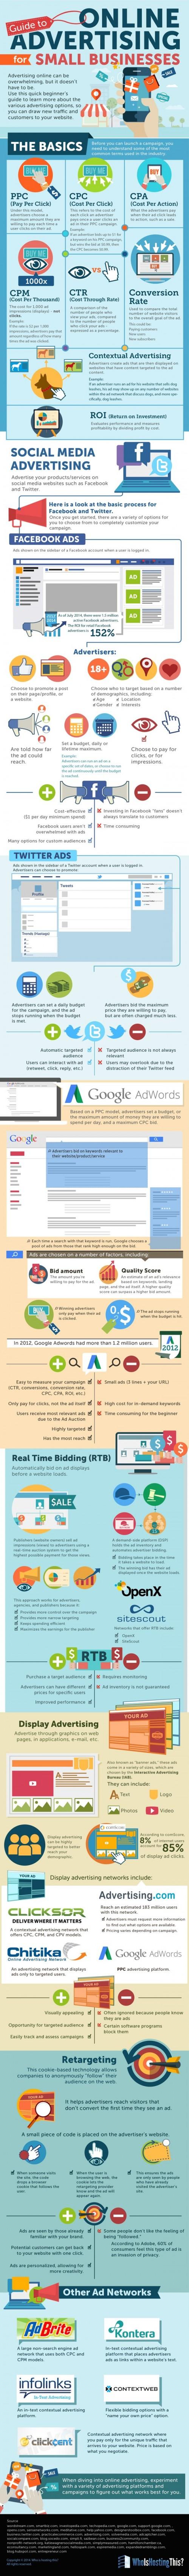 publicidad-online-infografia1